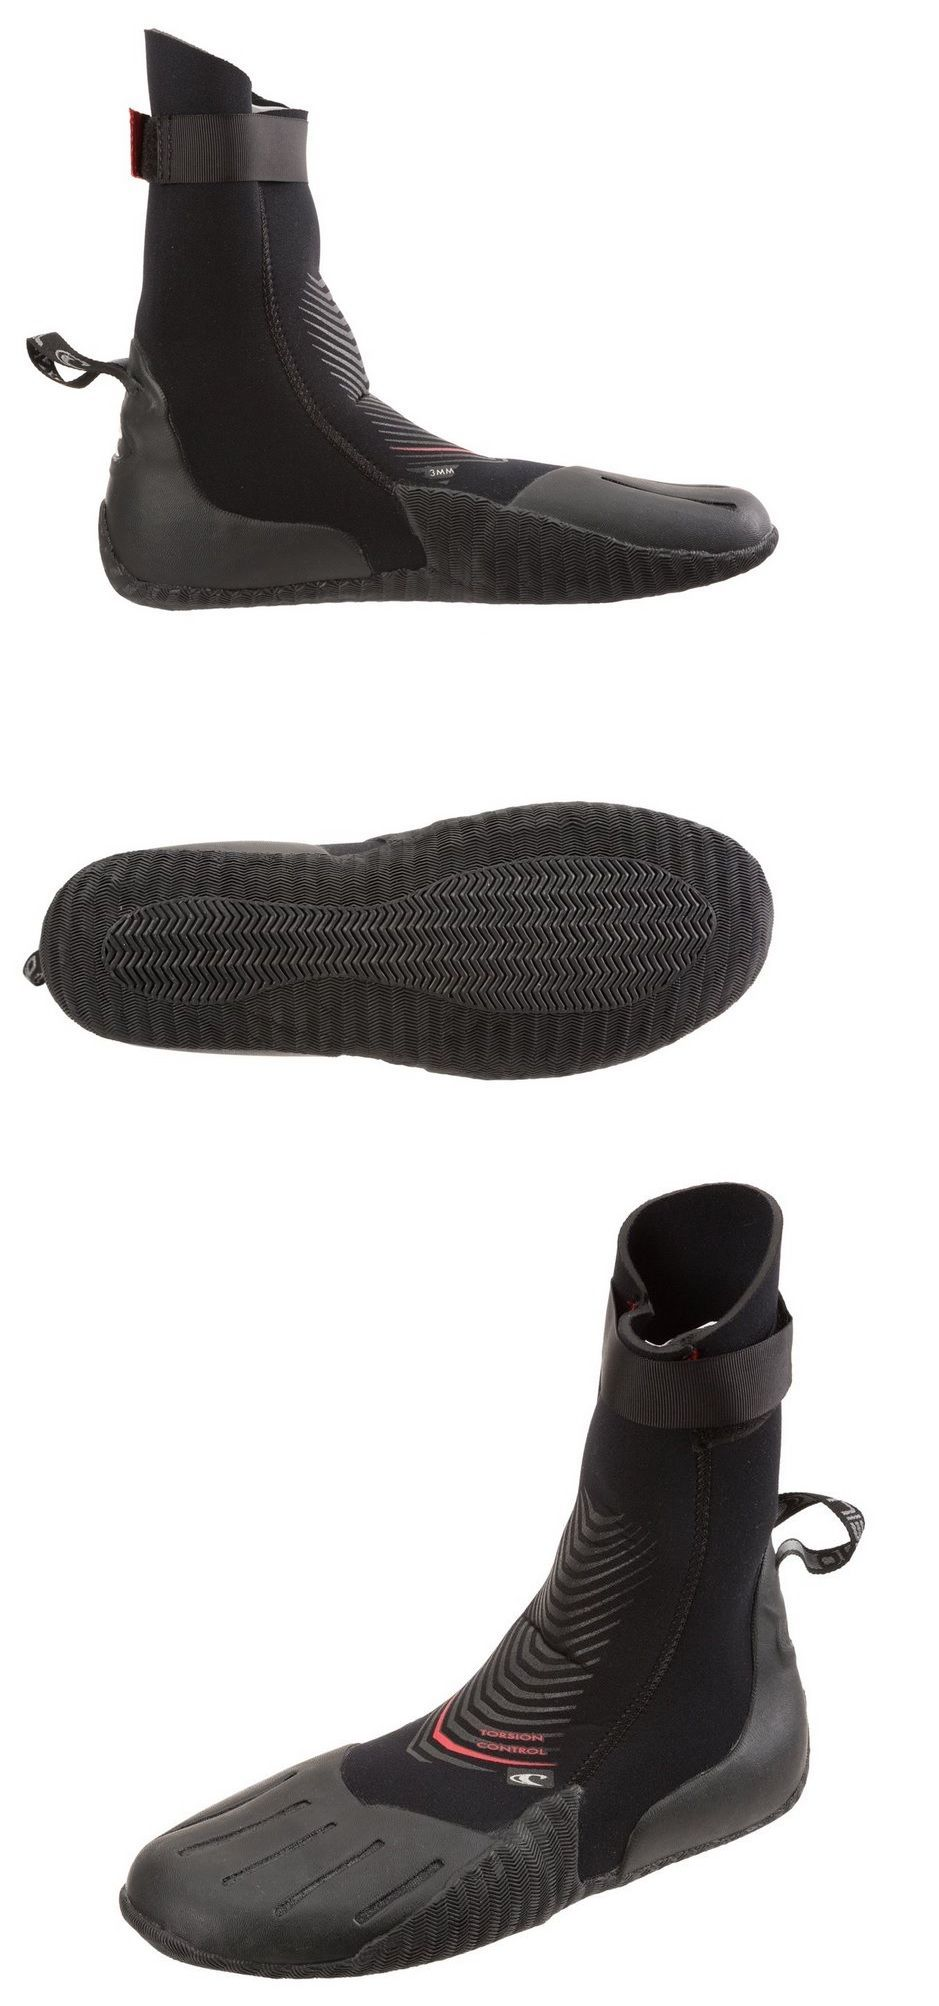 Boots Booties 114234  O Neill Heat 3Mm Round Toe Surf Boots - 9 ... 6d98d7625a